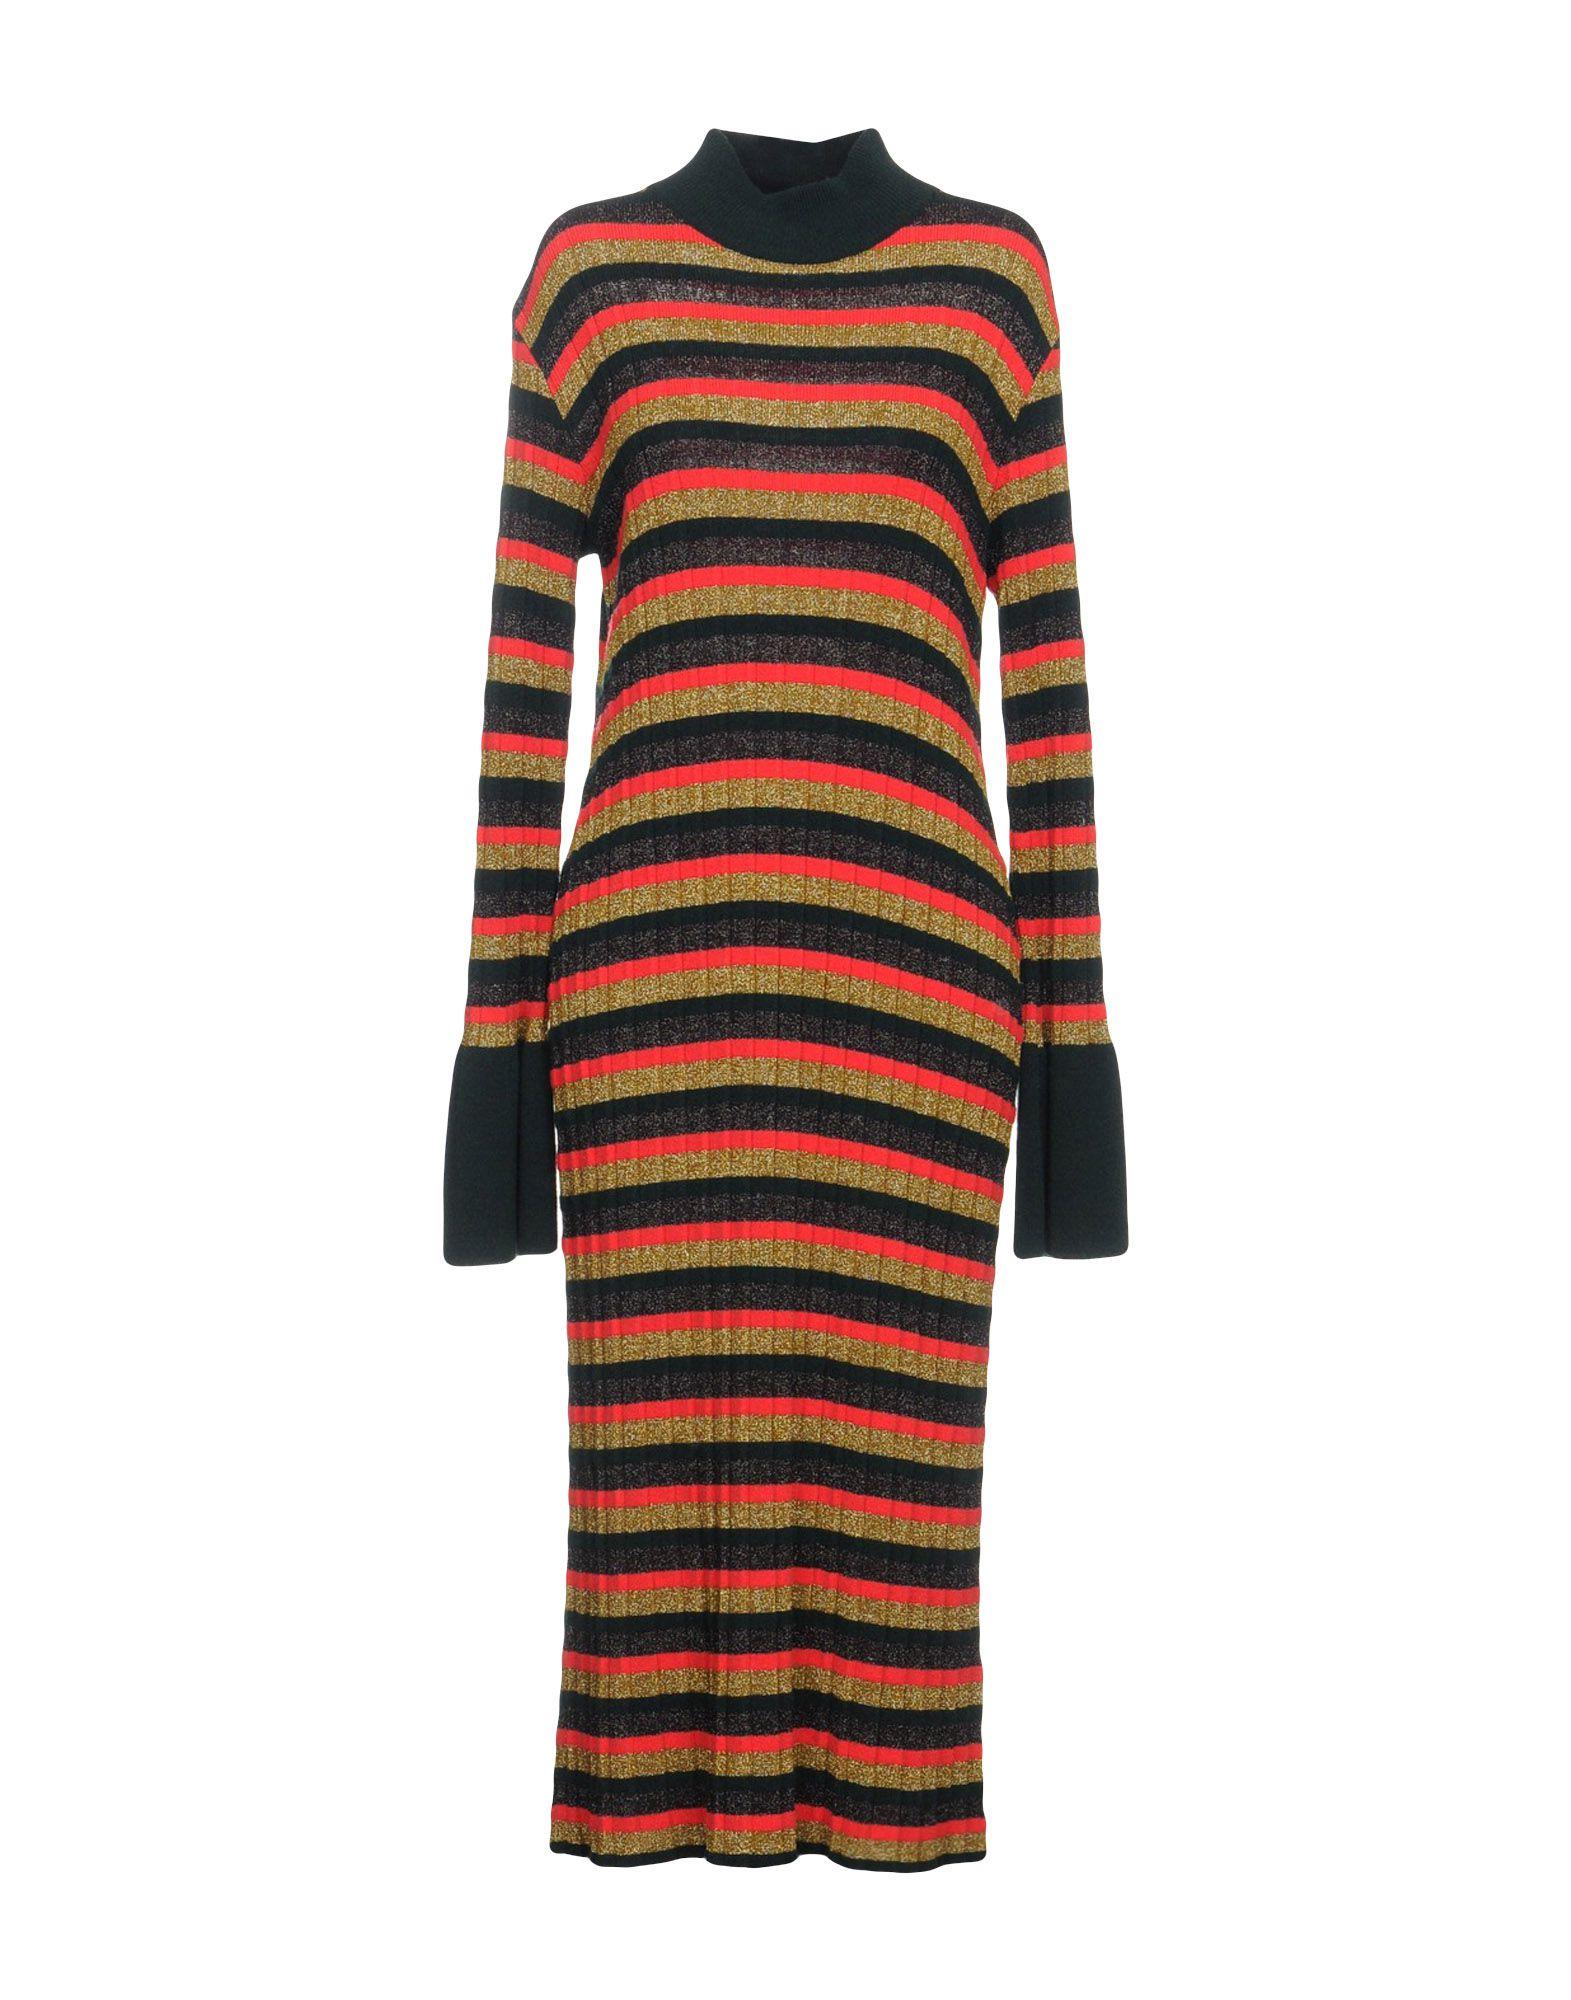 ALYSI Платье длиной 3/4 tenax платье длиной 3 4